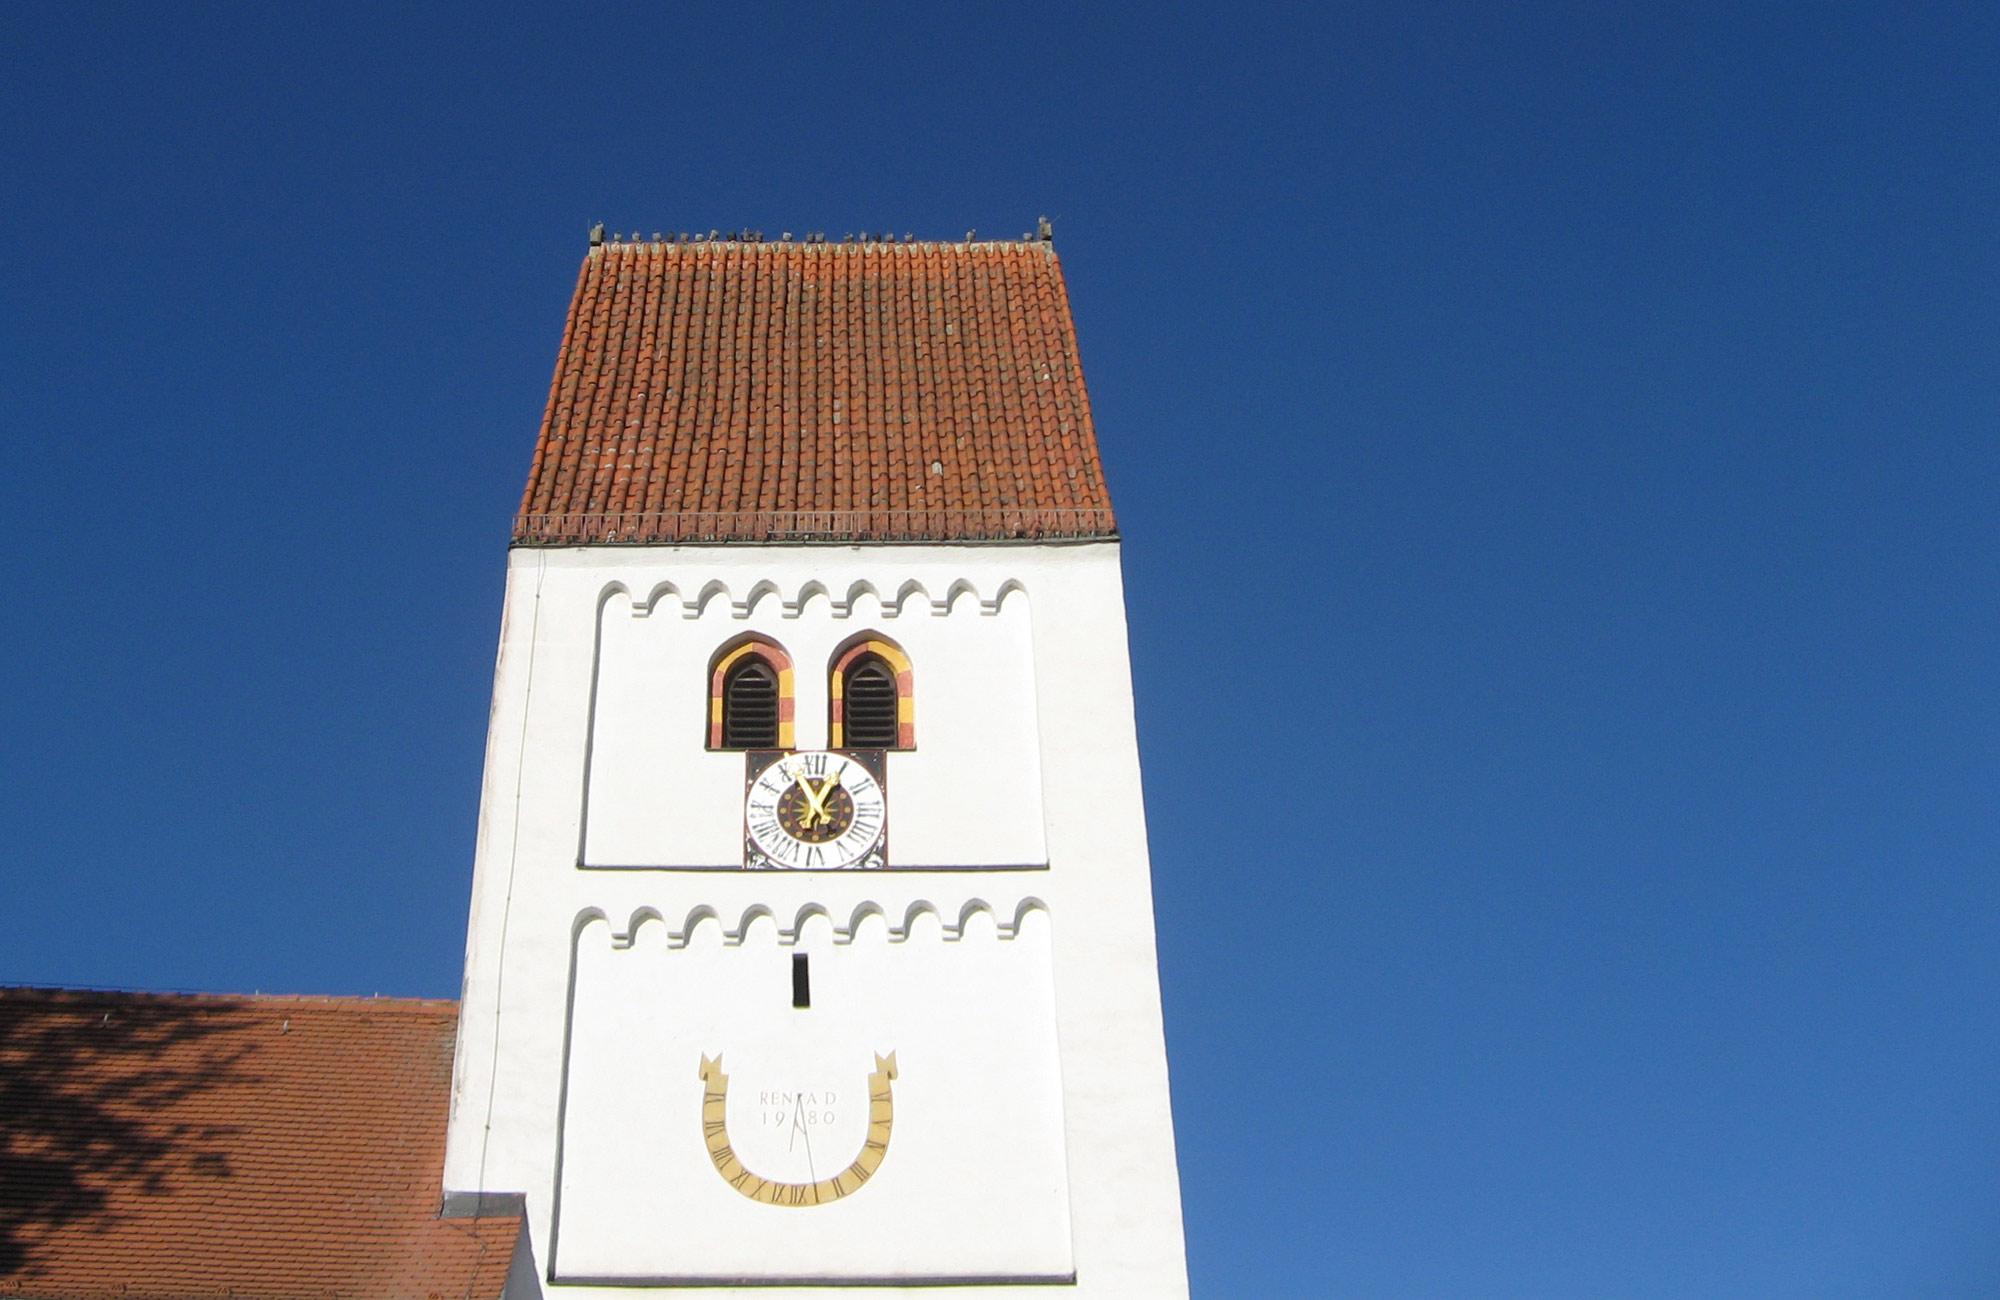 St. Michael in Hechendorf